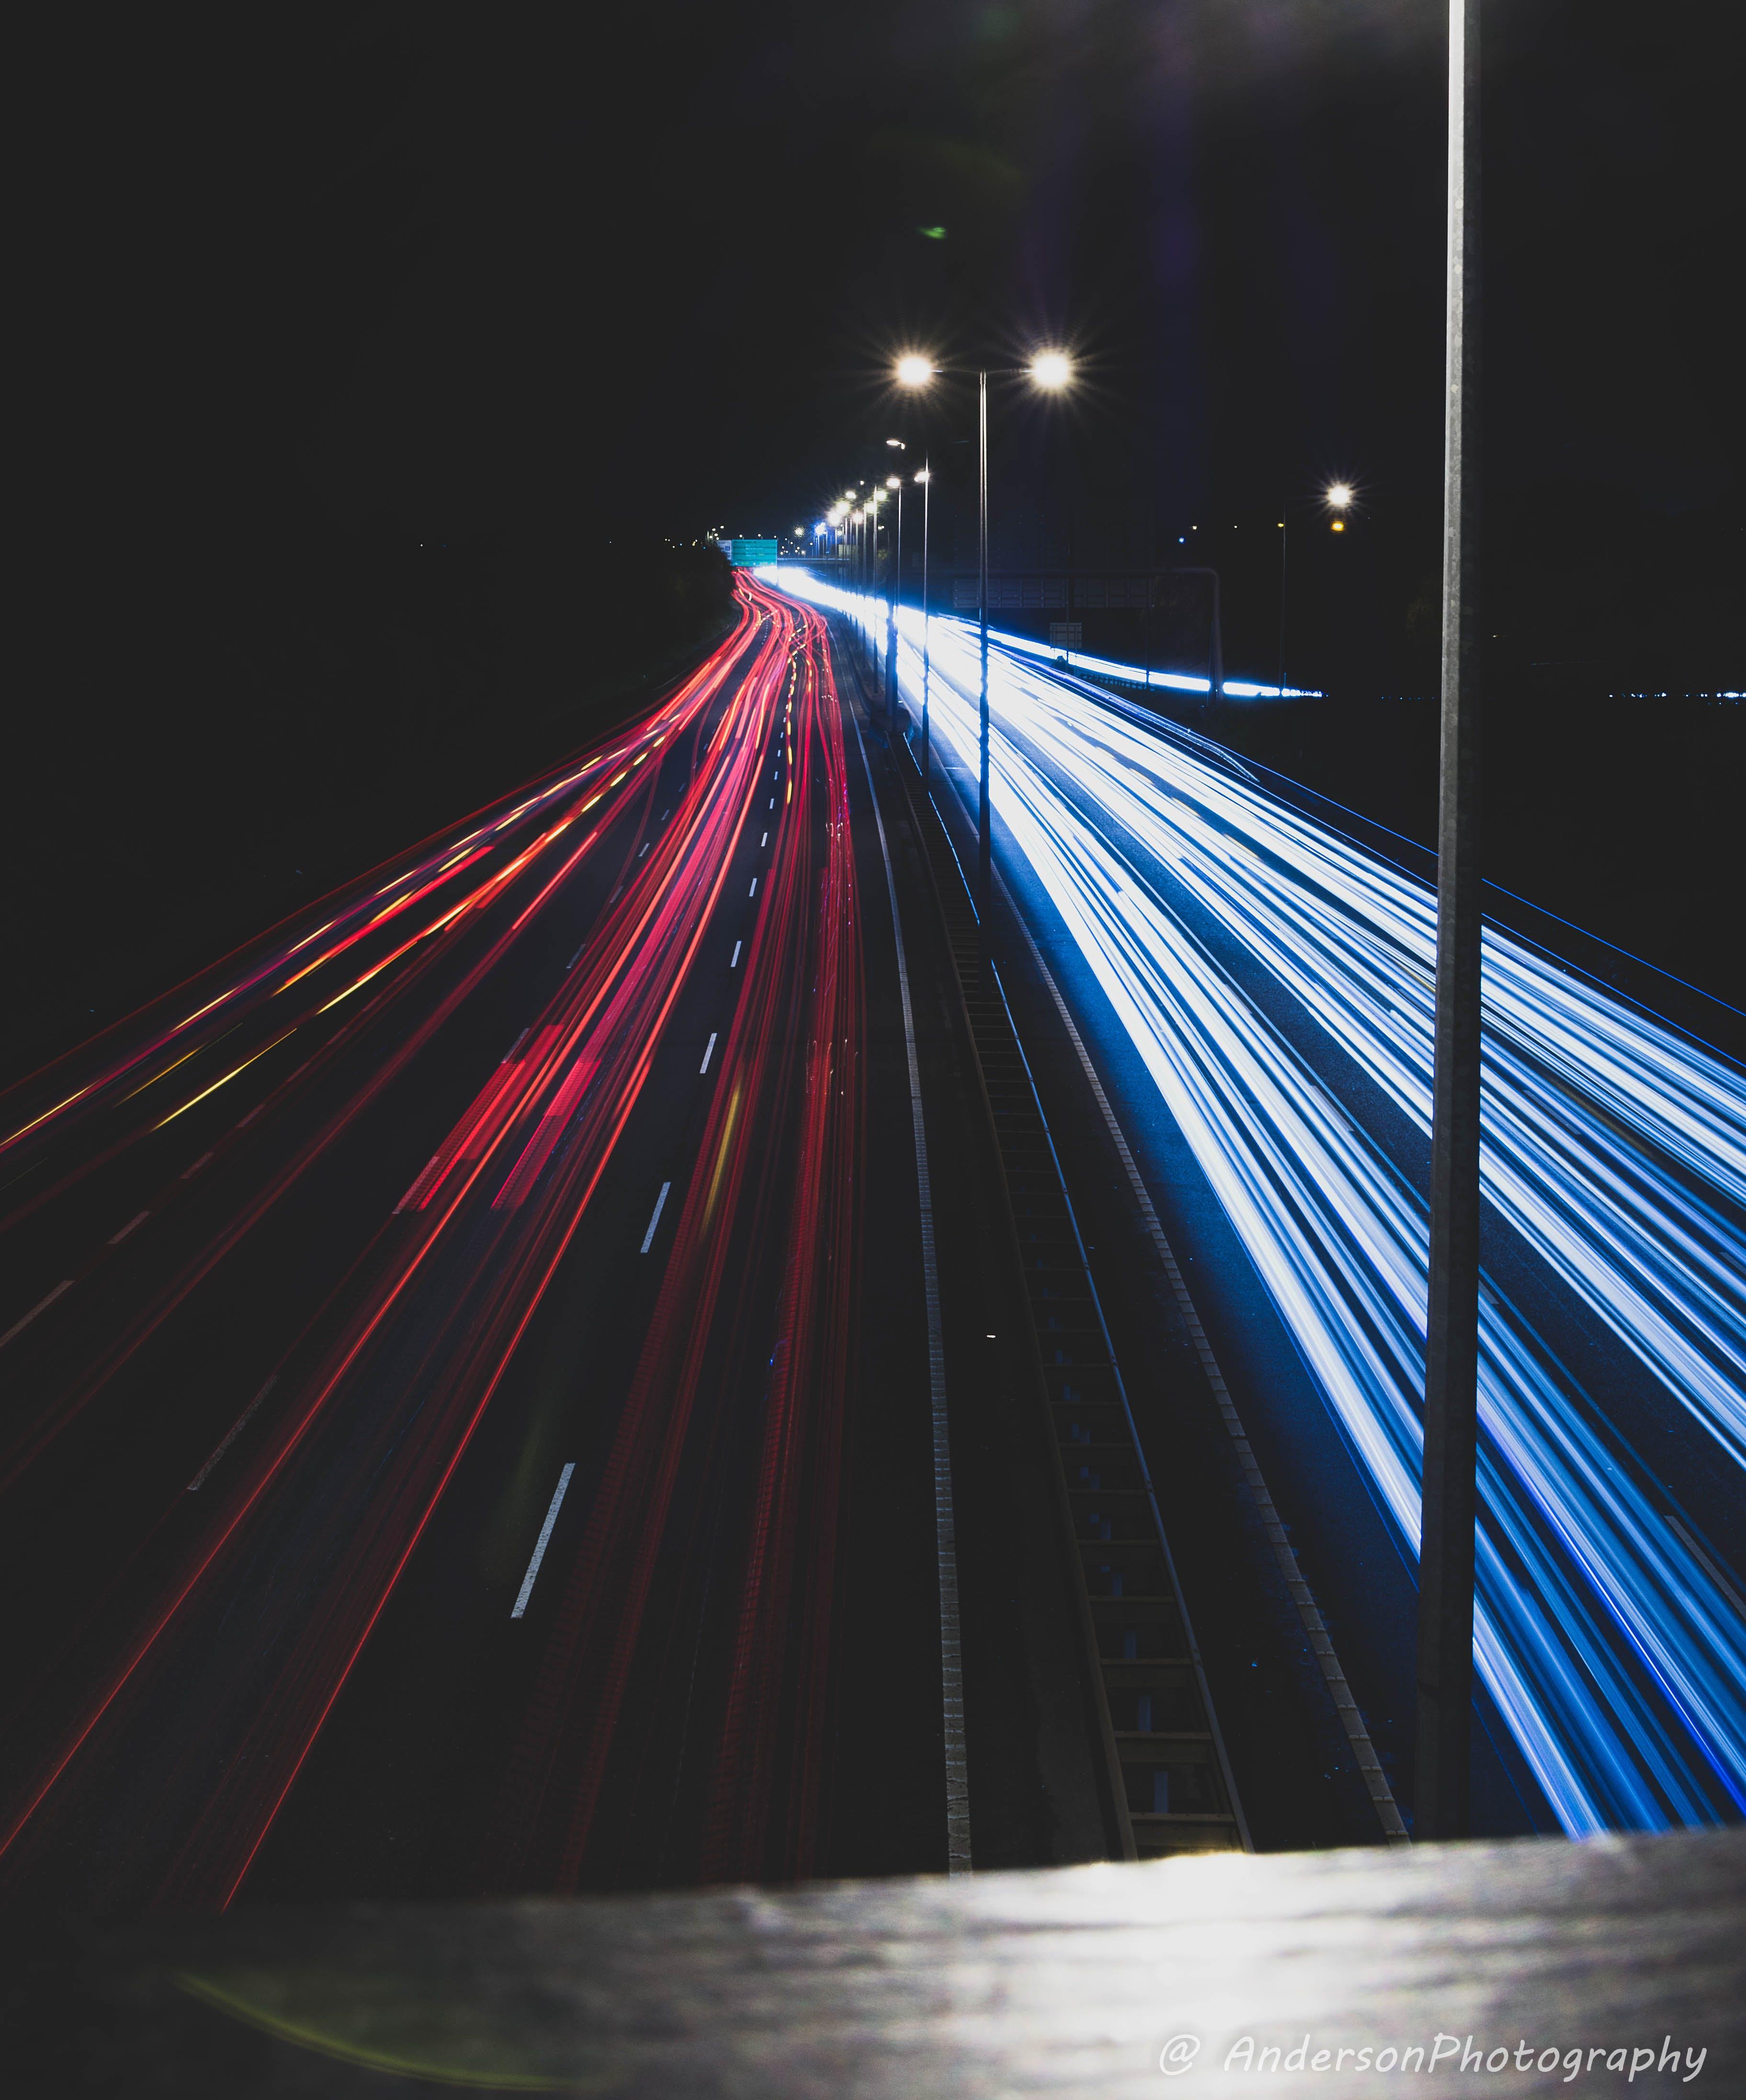 Free stock photo of car lights, cars, exposure, light trail